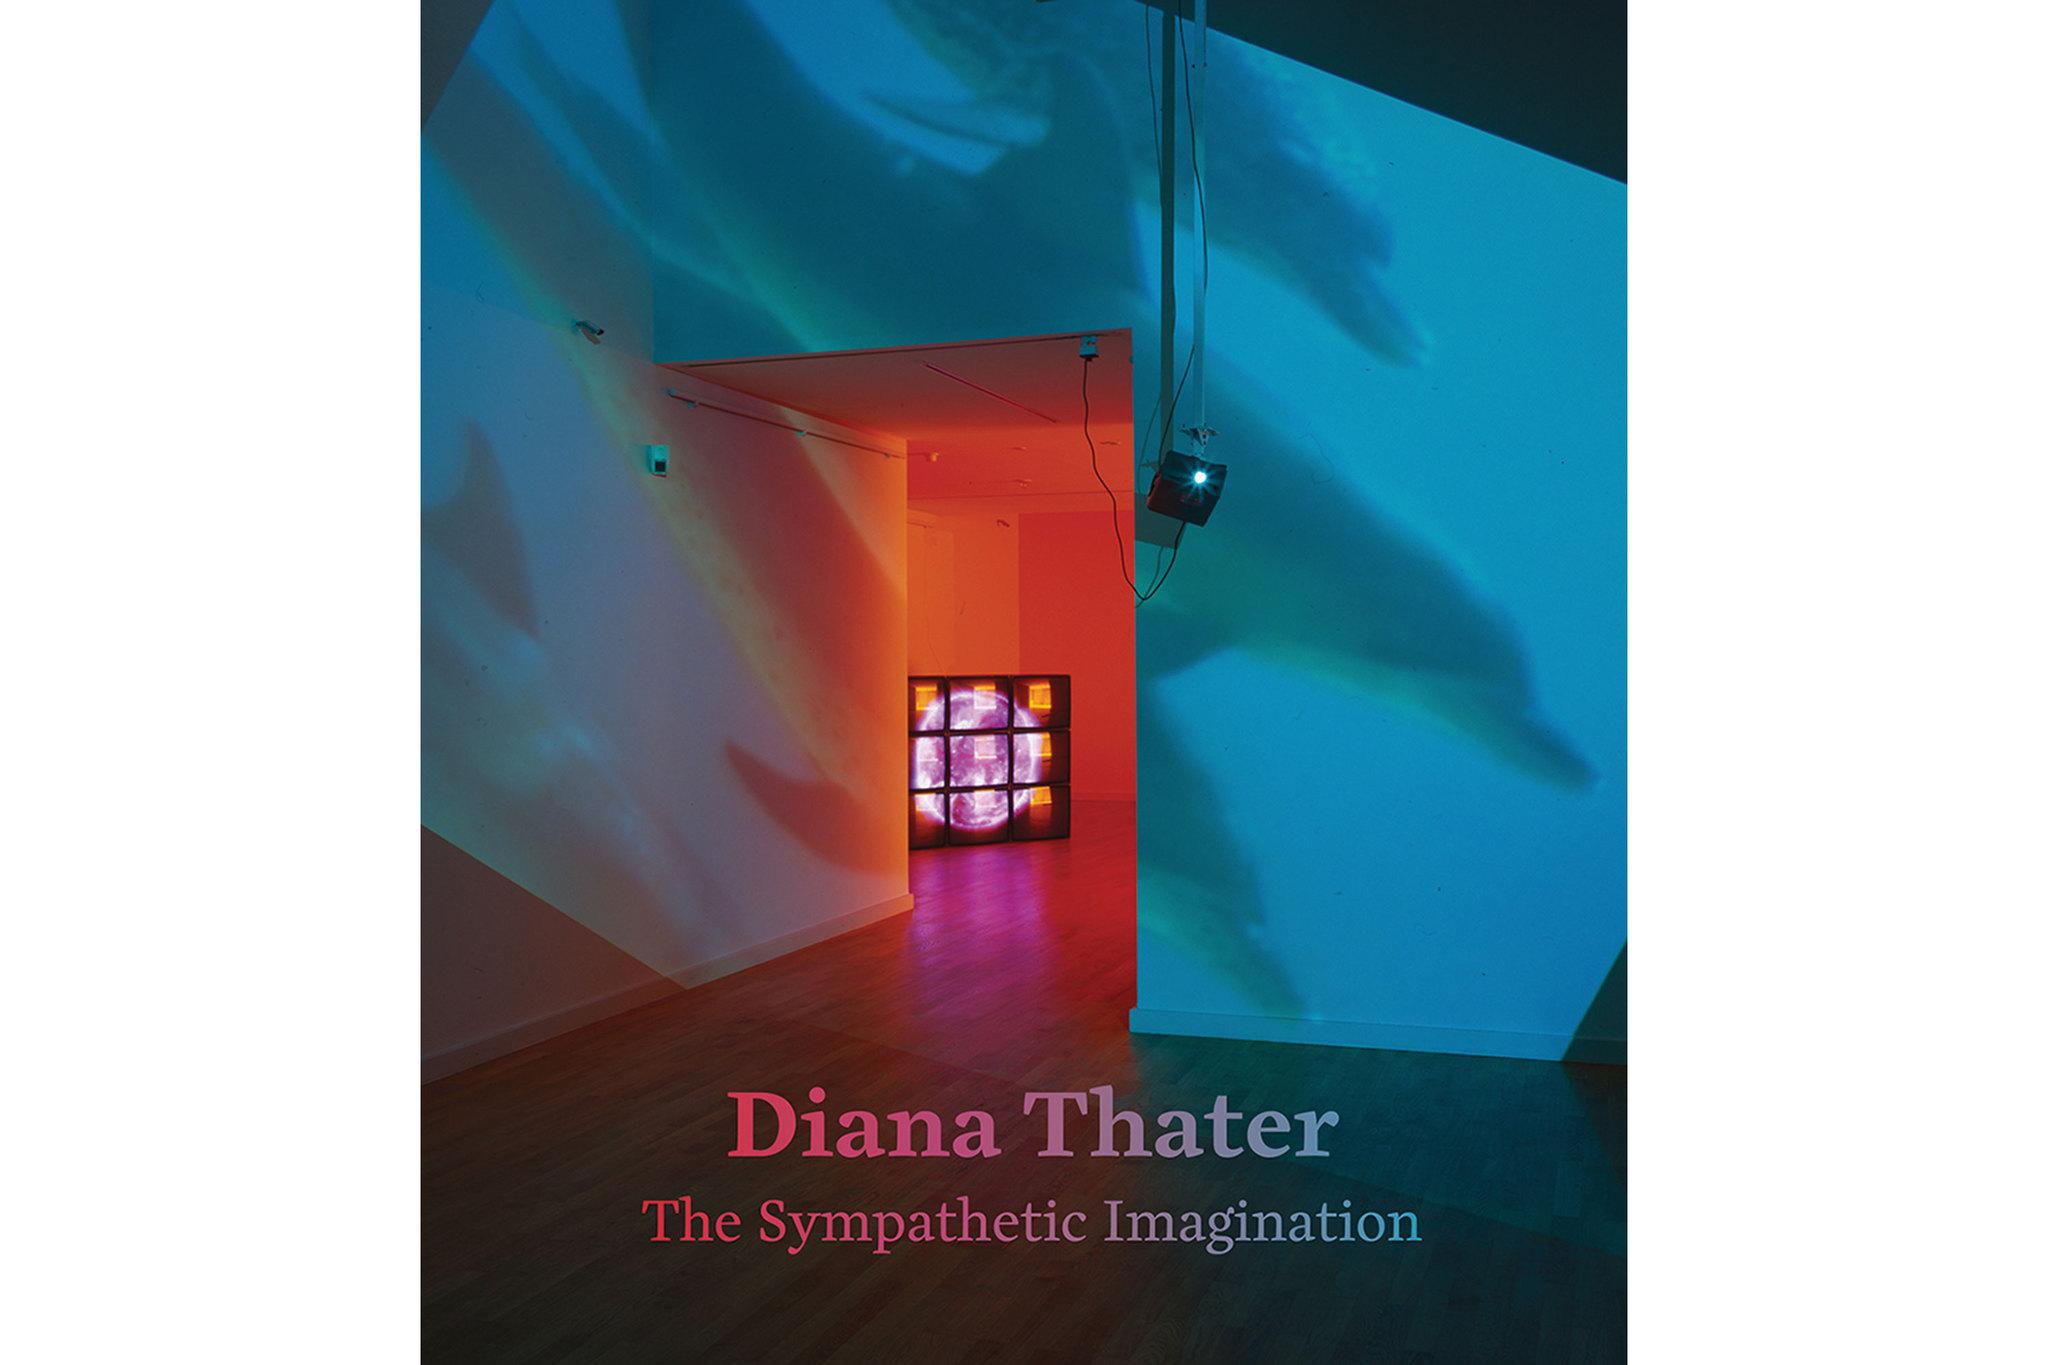 Thater sympathetic imagination